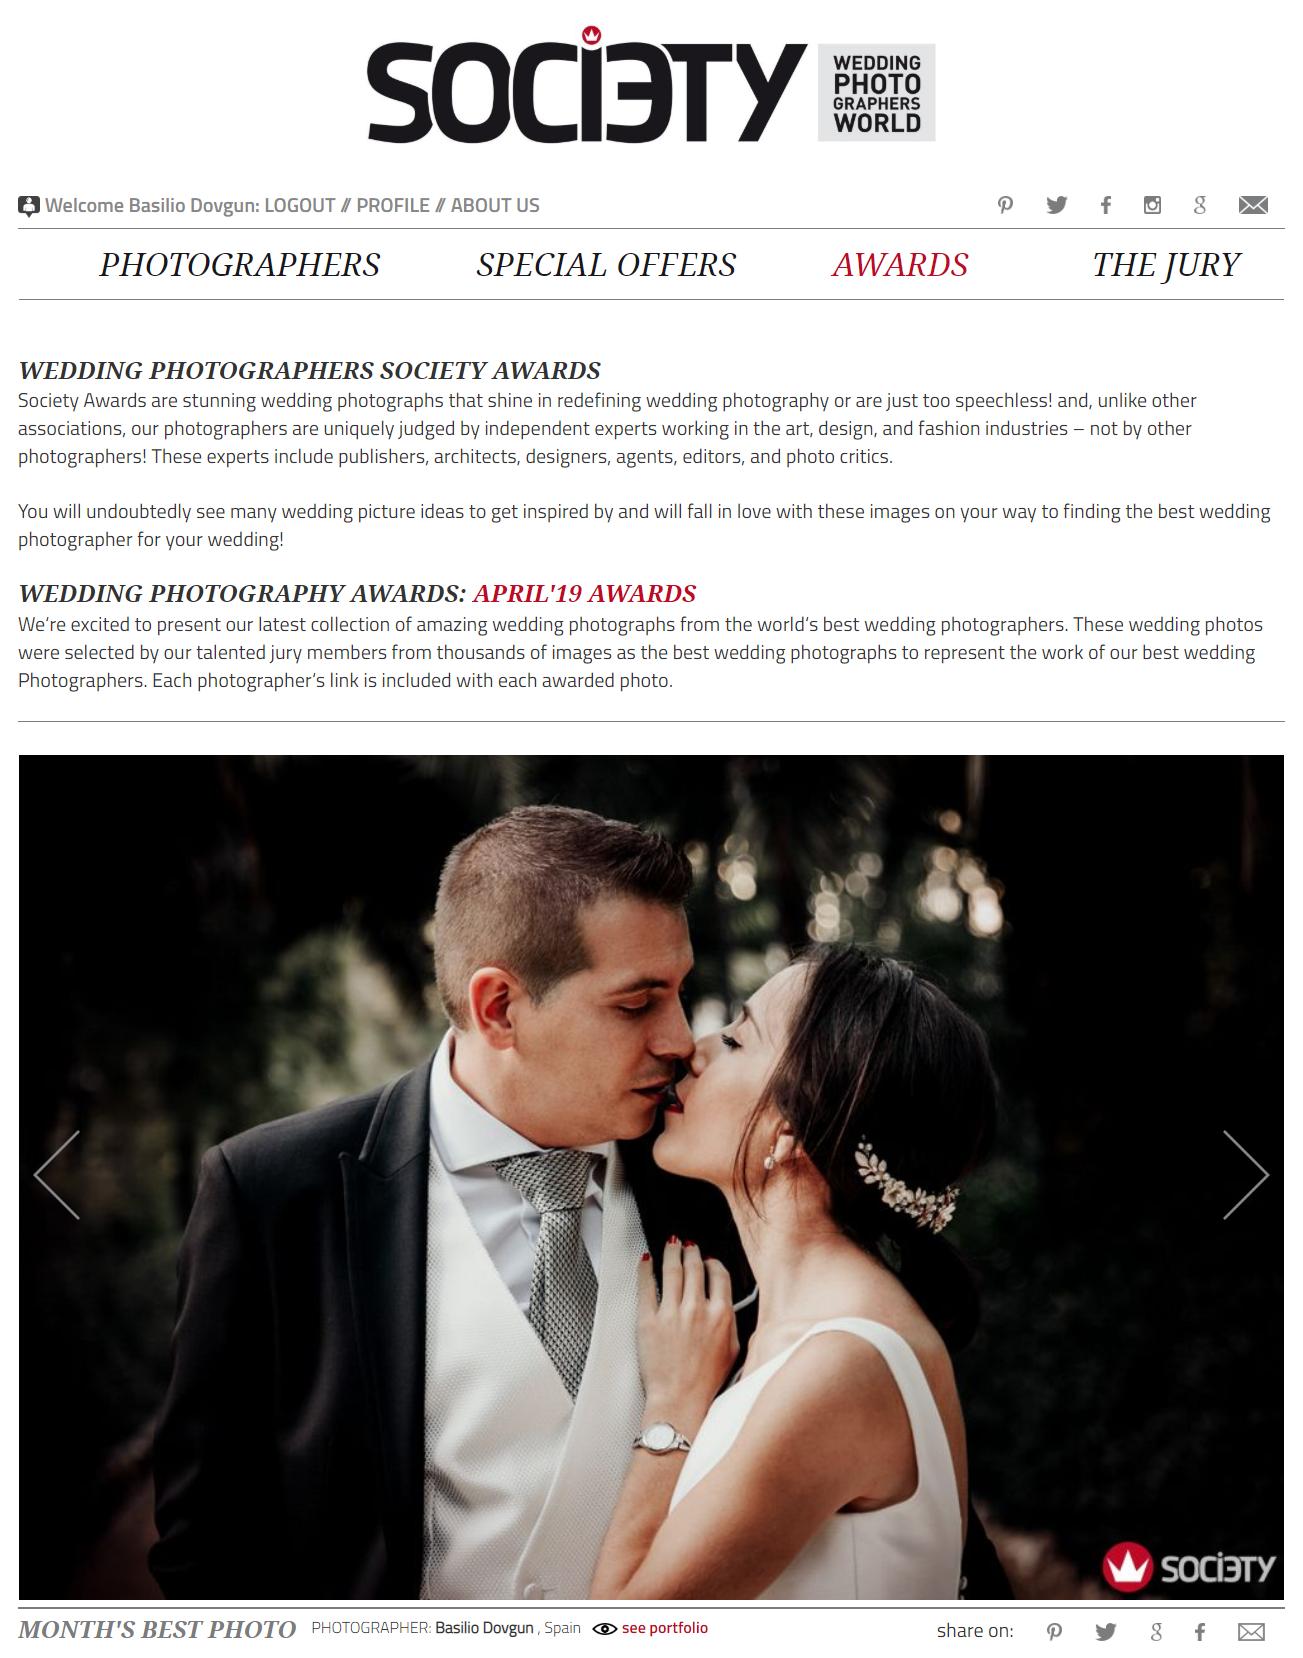 Premio internacional de mejor fotografo de bodas